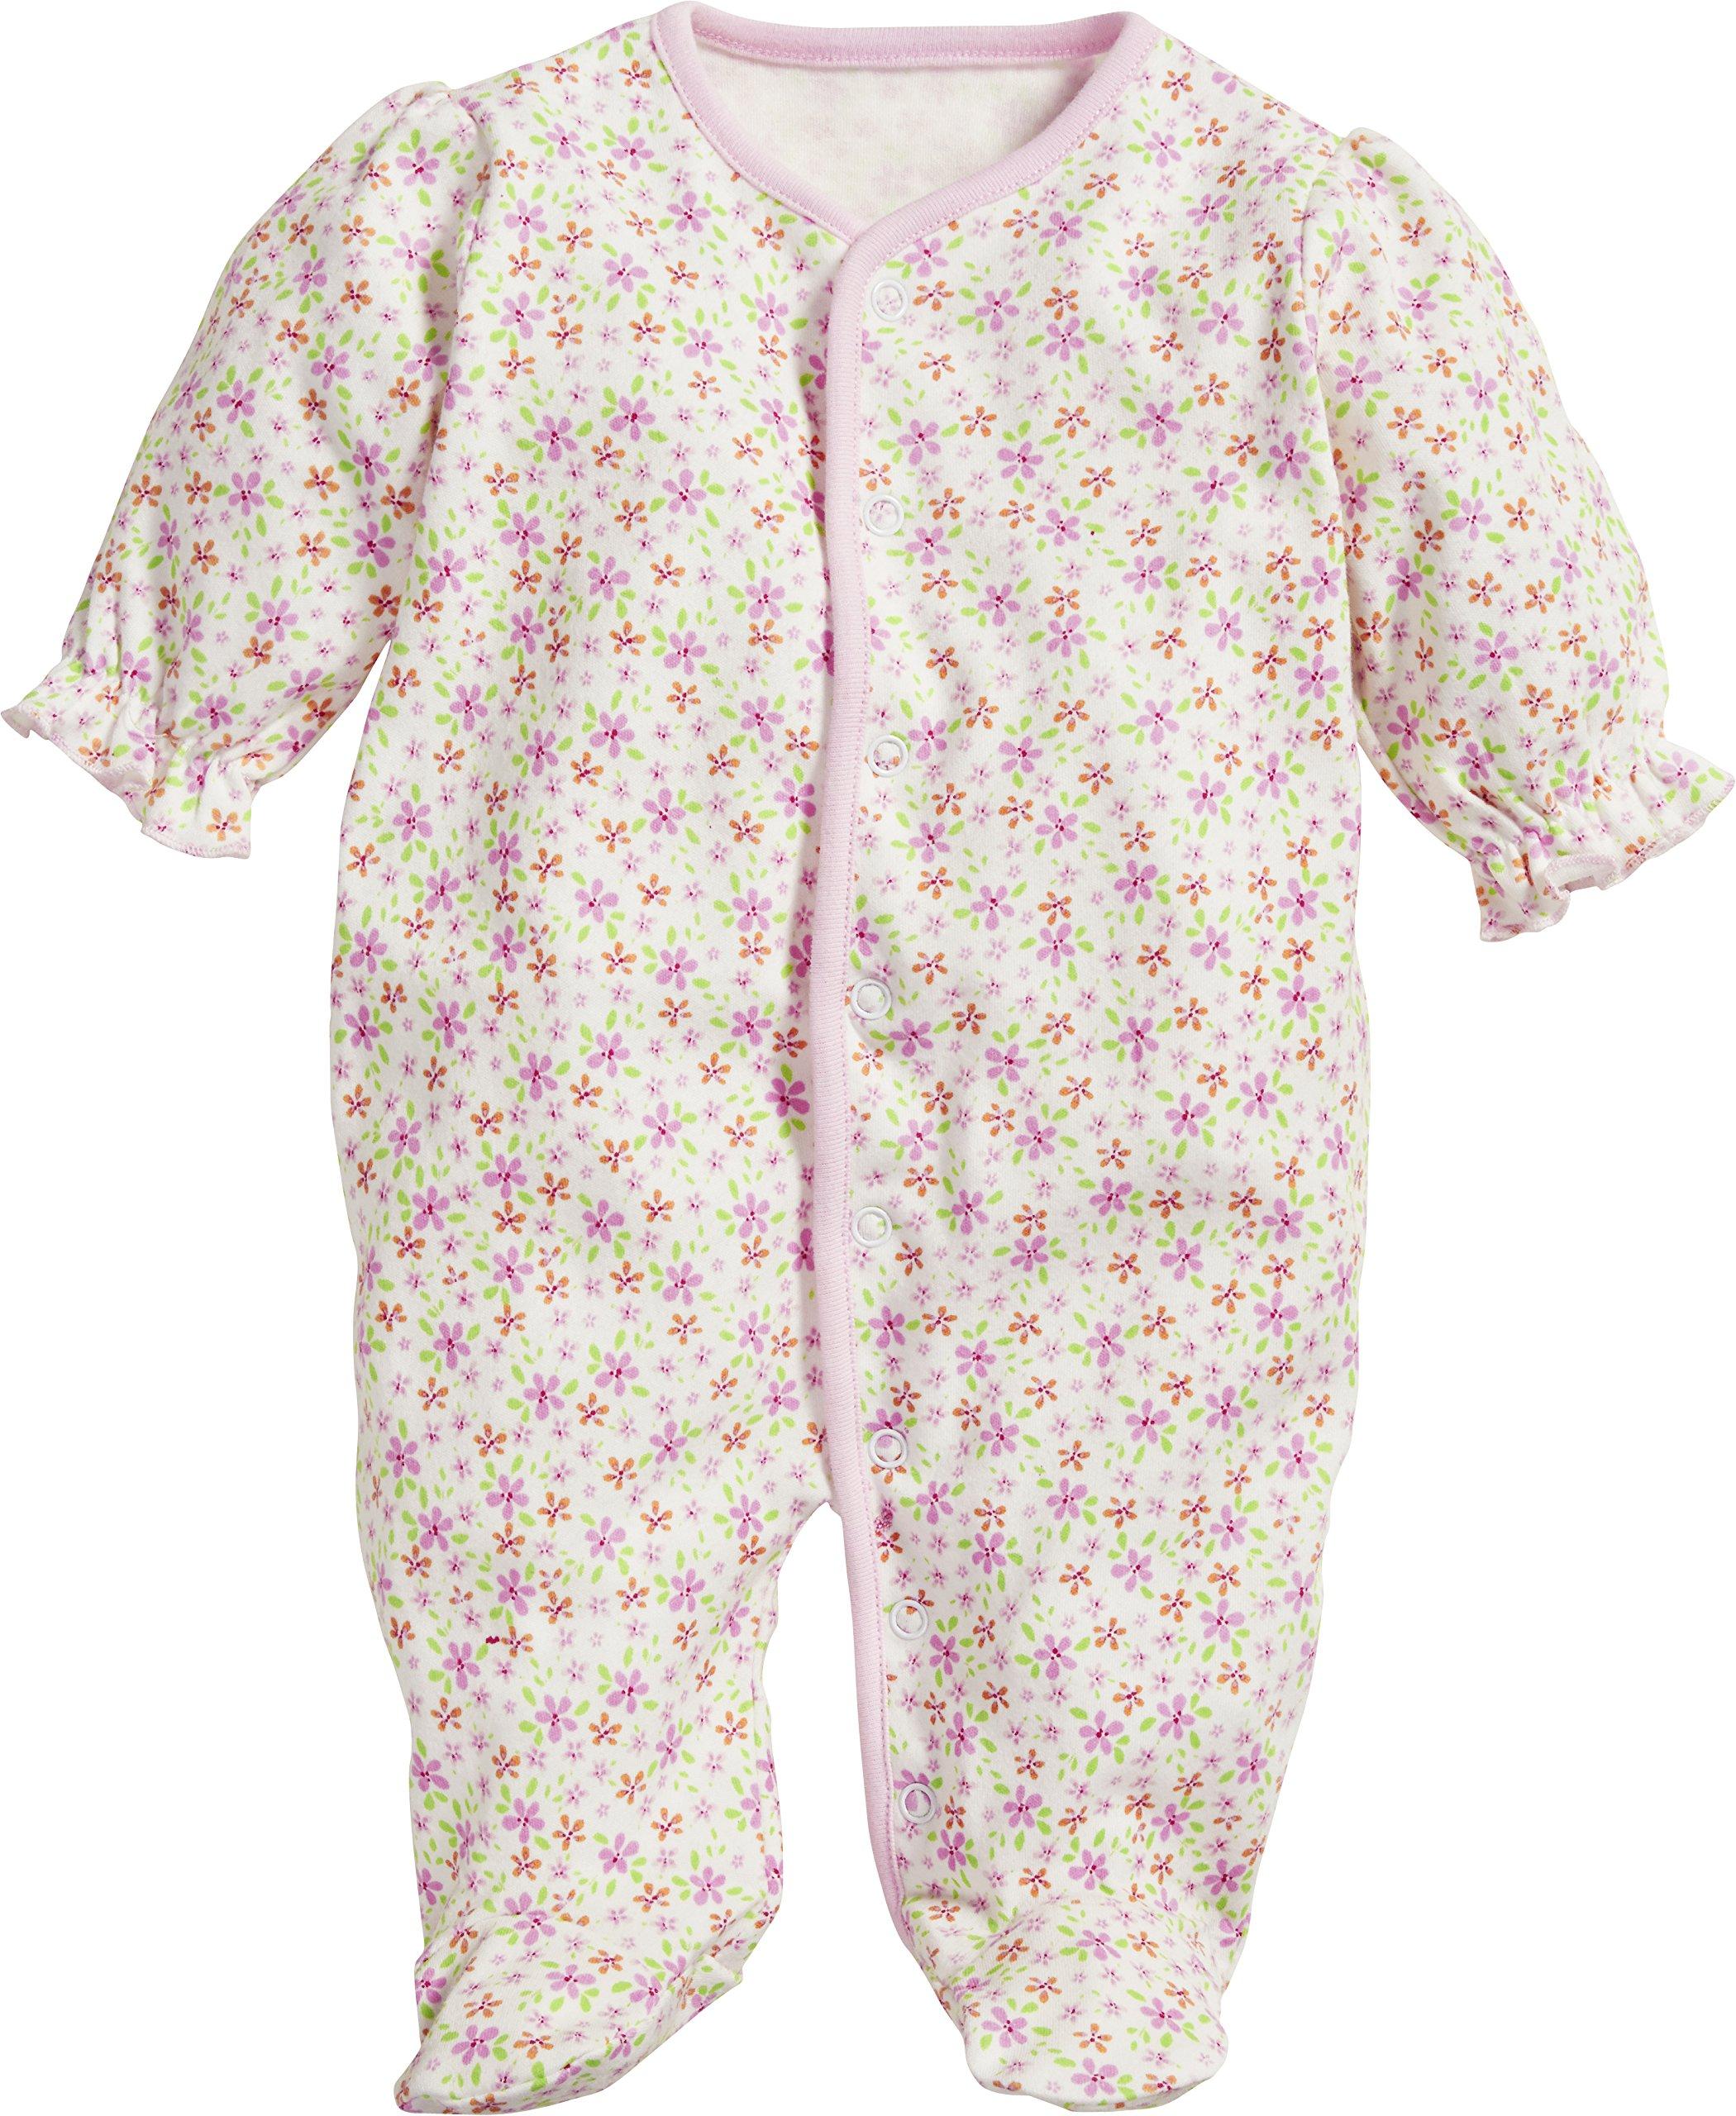 Schnizler Schlafoverall Interlock Blumen Pijama para Bebés 1